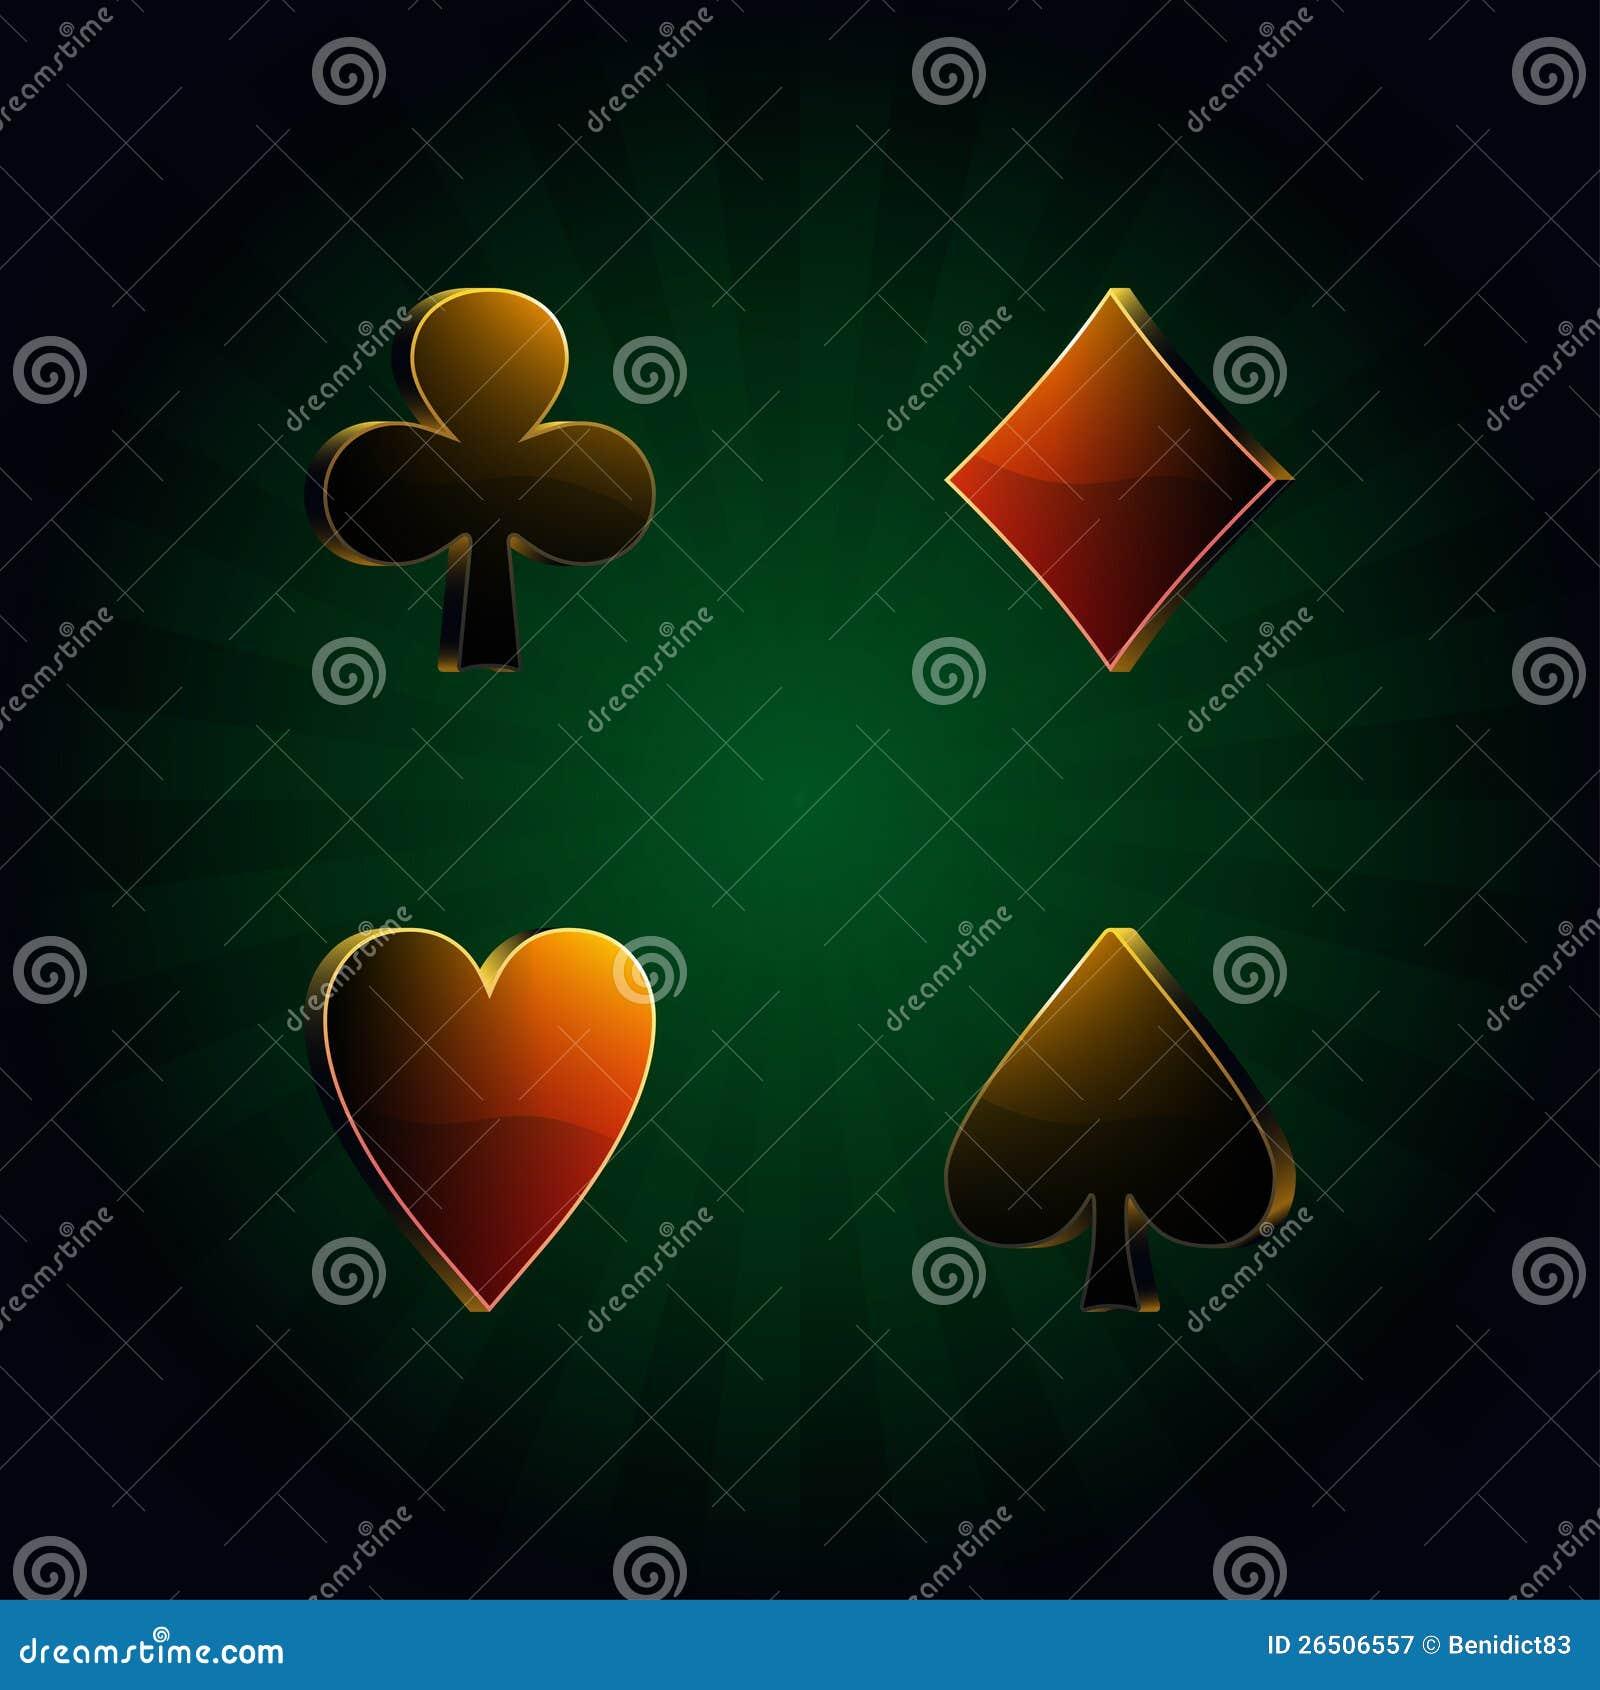 Póquer, illustr do vetor